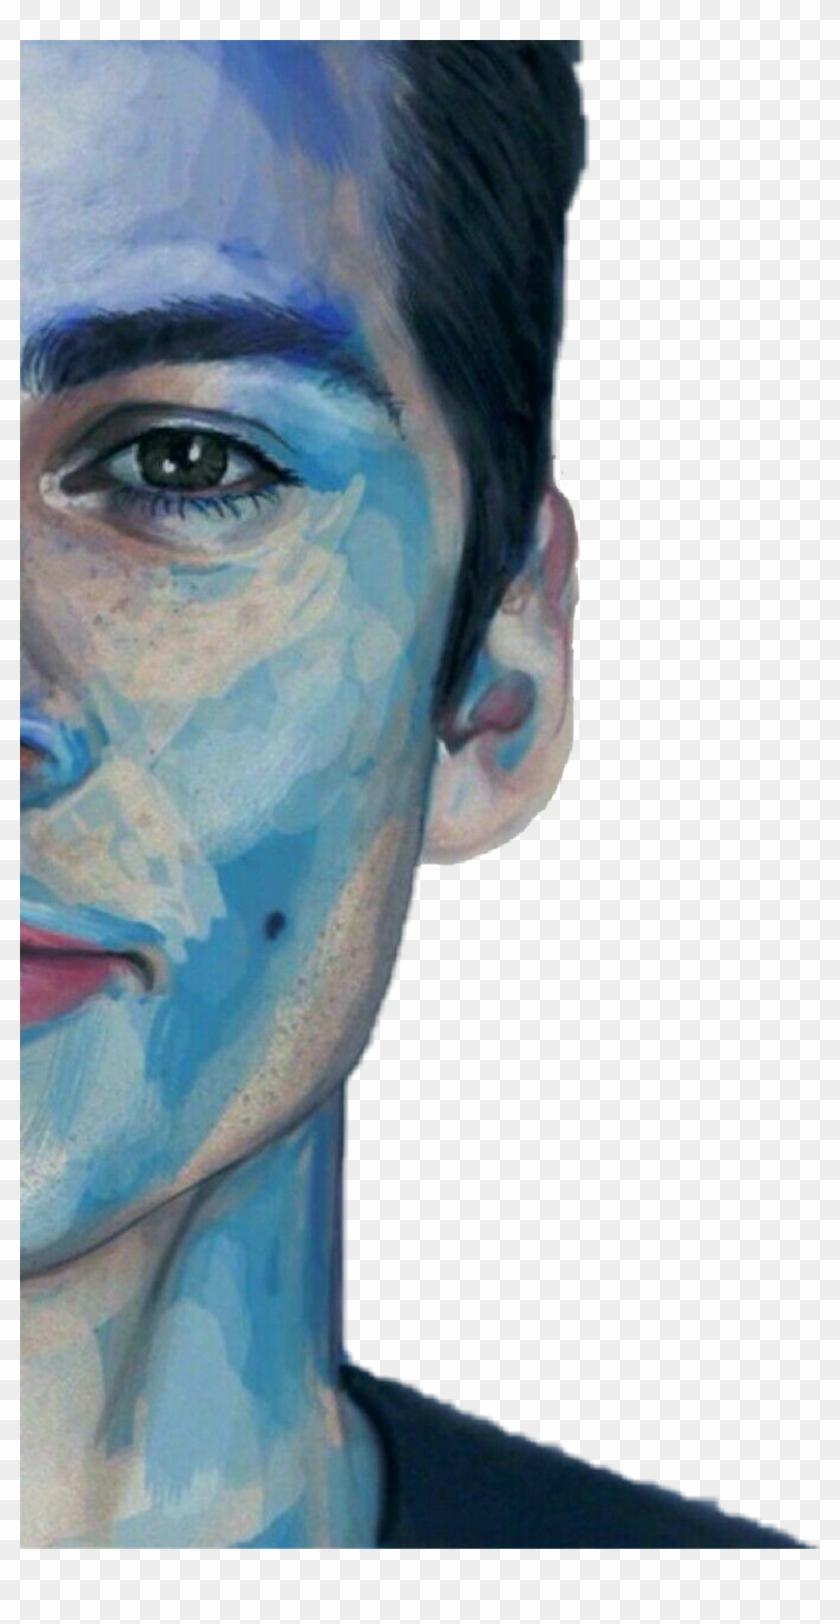 """Dylan O'Brien"" T-shirt by Pineapplexpress   Redbubble  Monochromatic Portrait Dylan Obrien"